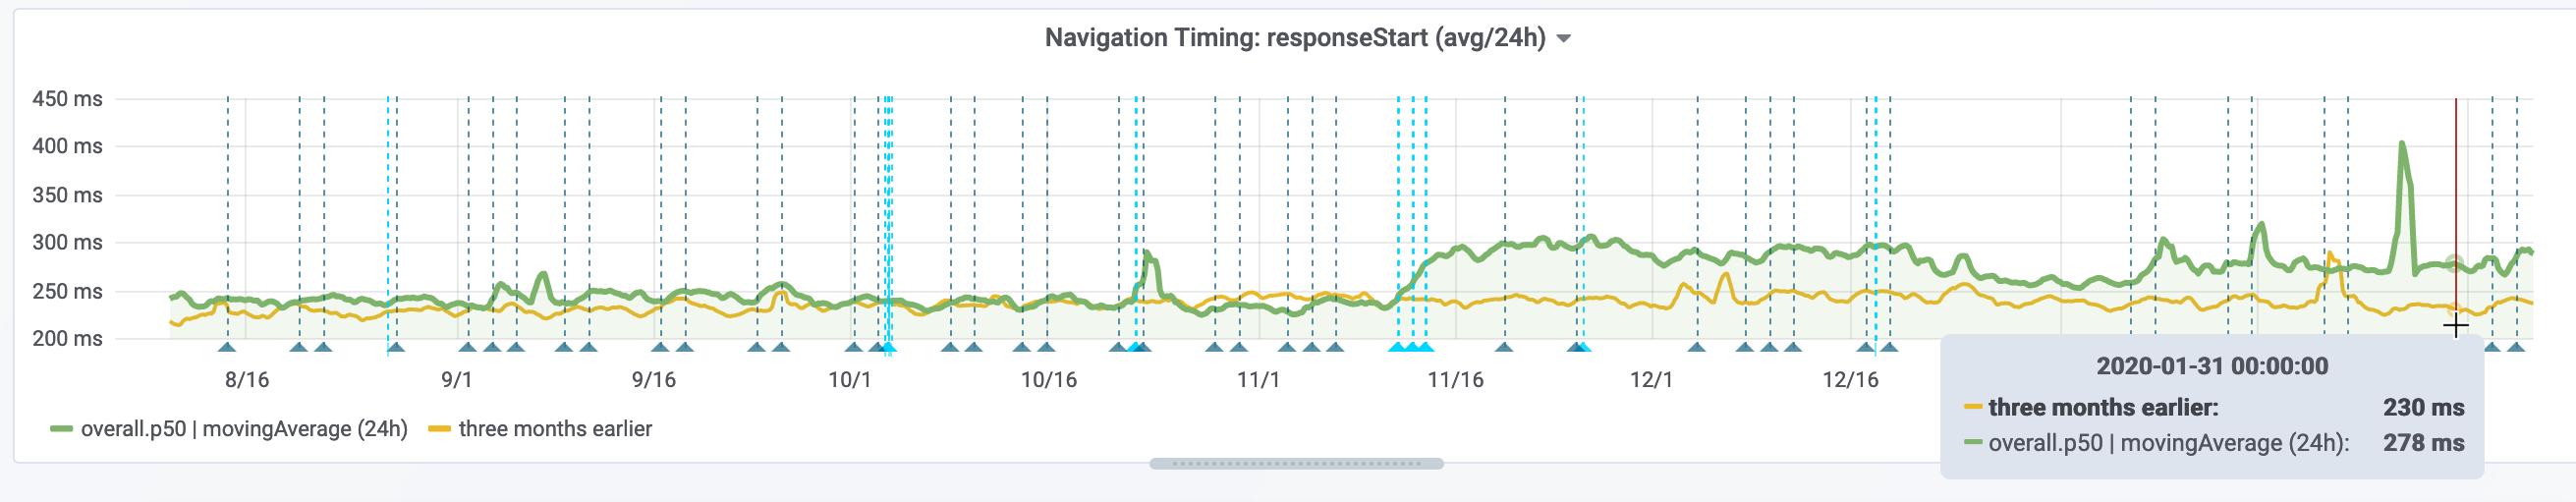 Screenshot 2020-02-06 at 00.39.50.png (511×2 px, 162 KB)